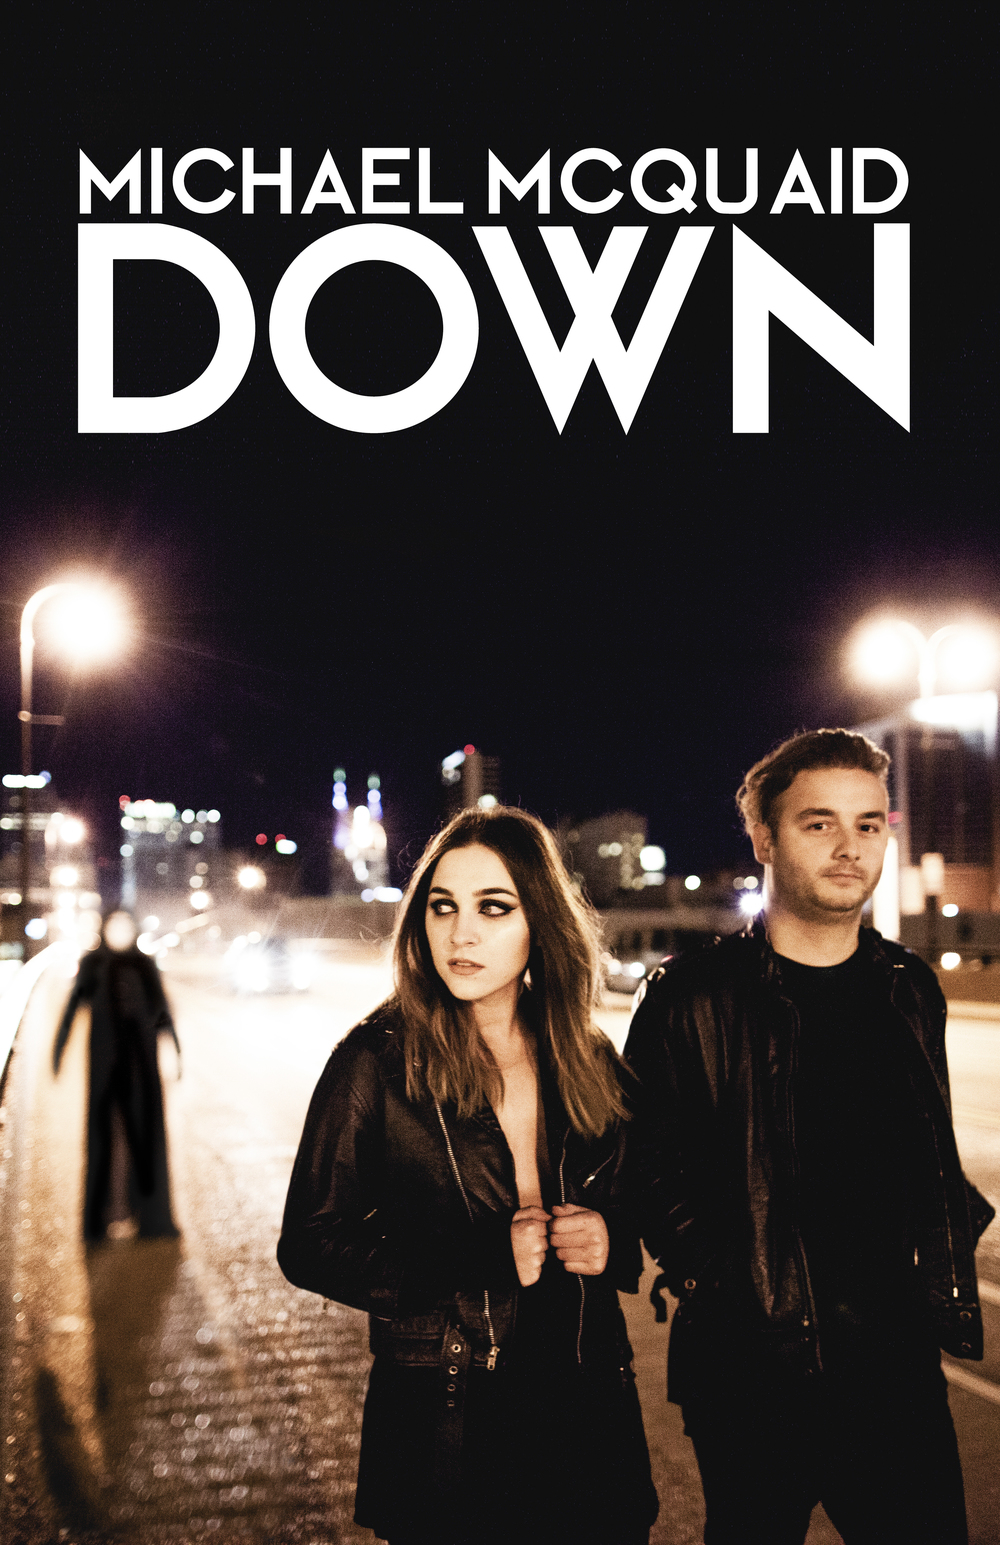 down poster.jpg